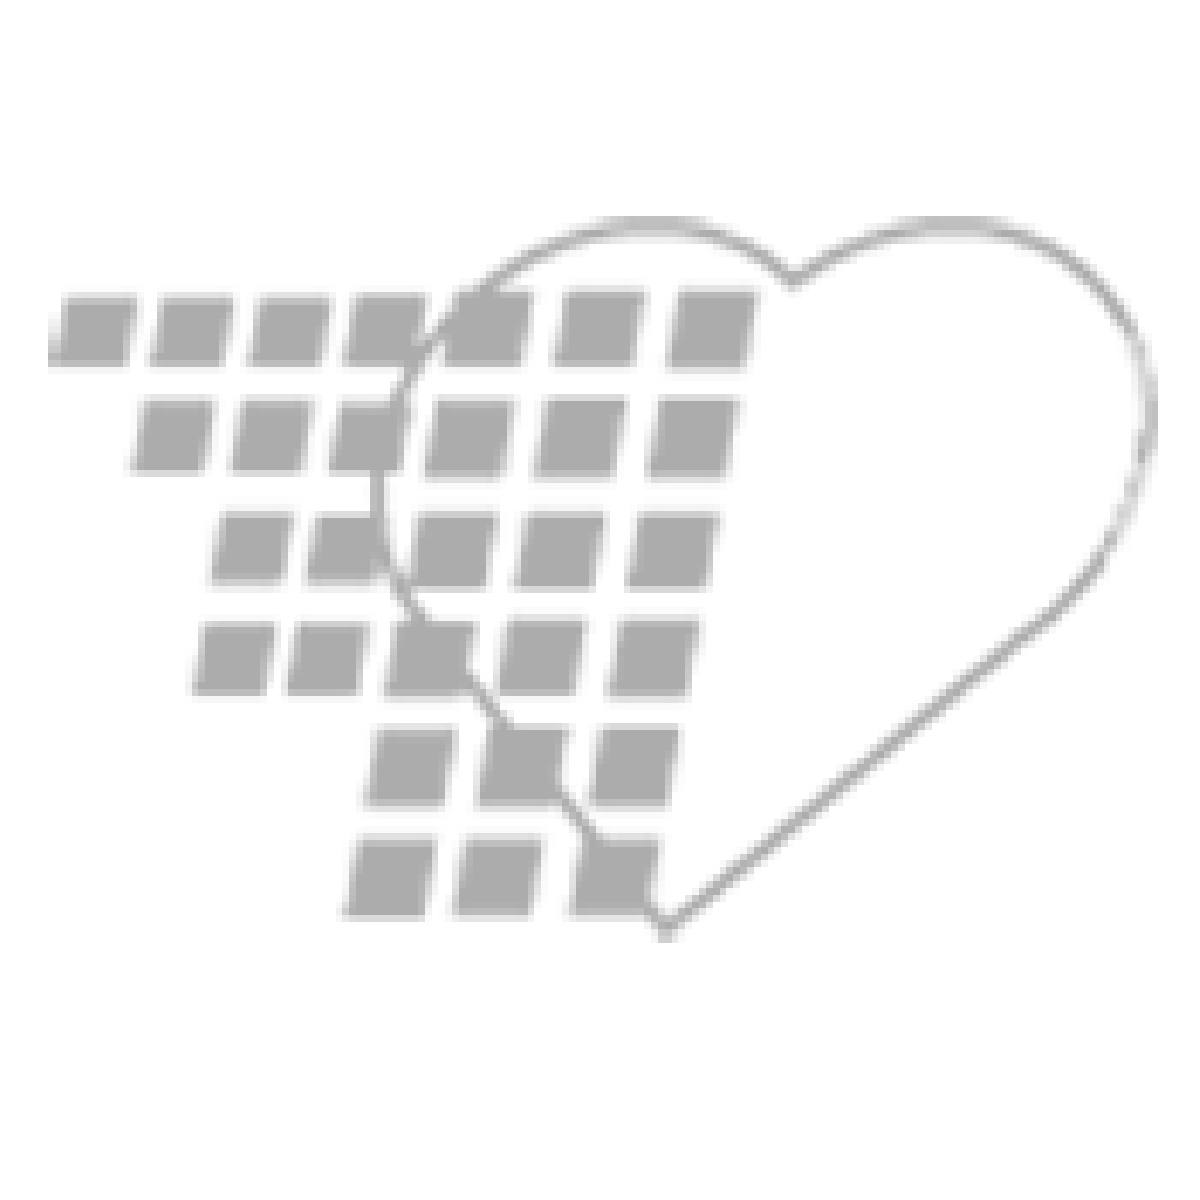 06-93-1107 - Demo Dose® Vasopressn Pitressn 20 units mL 10 mL